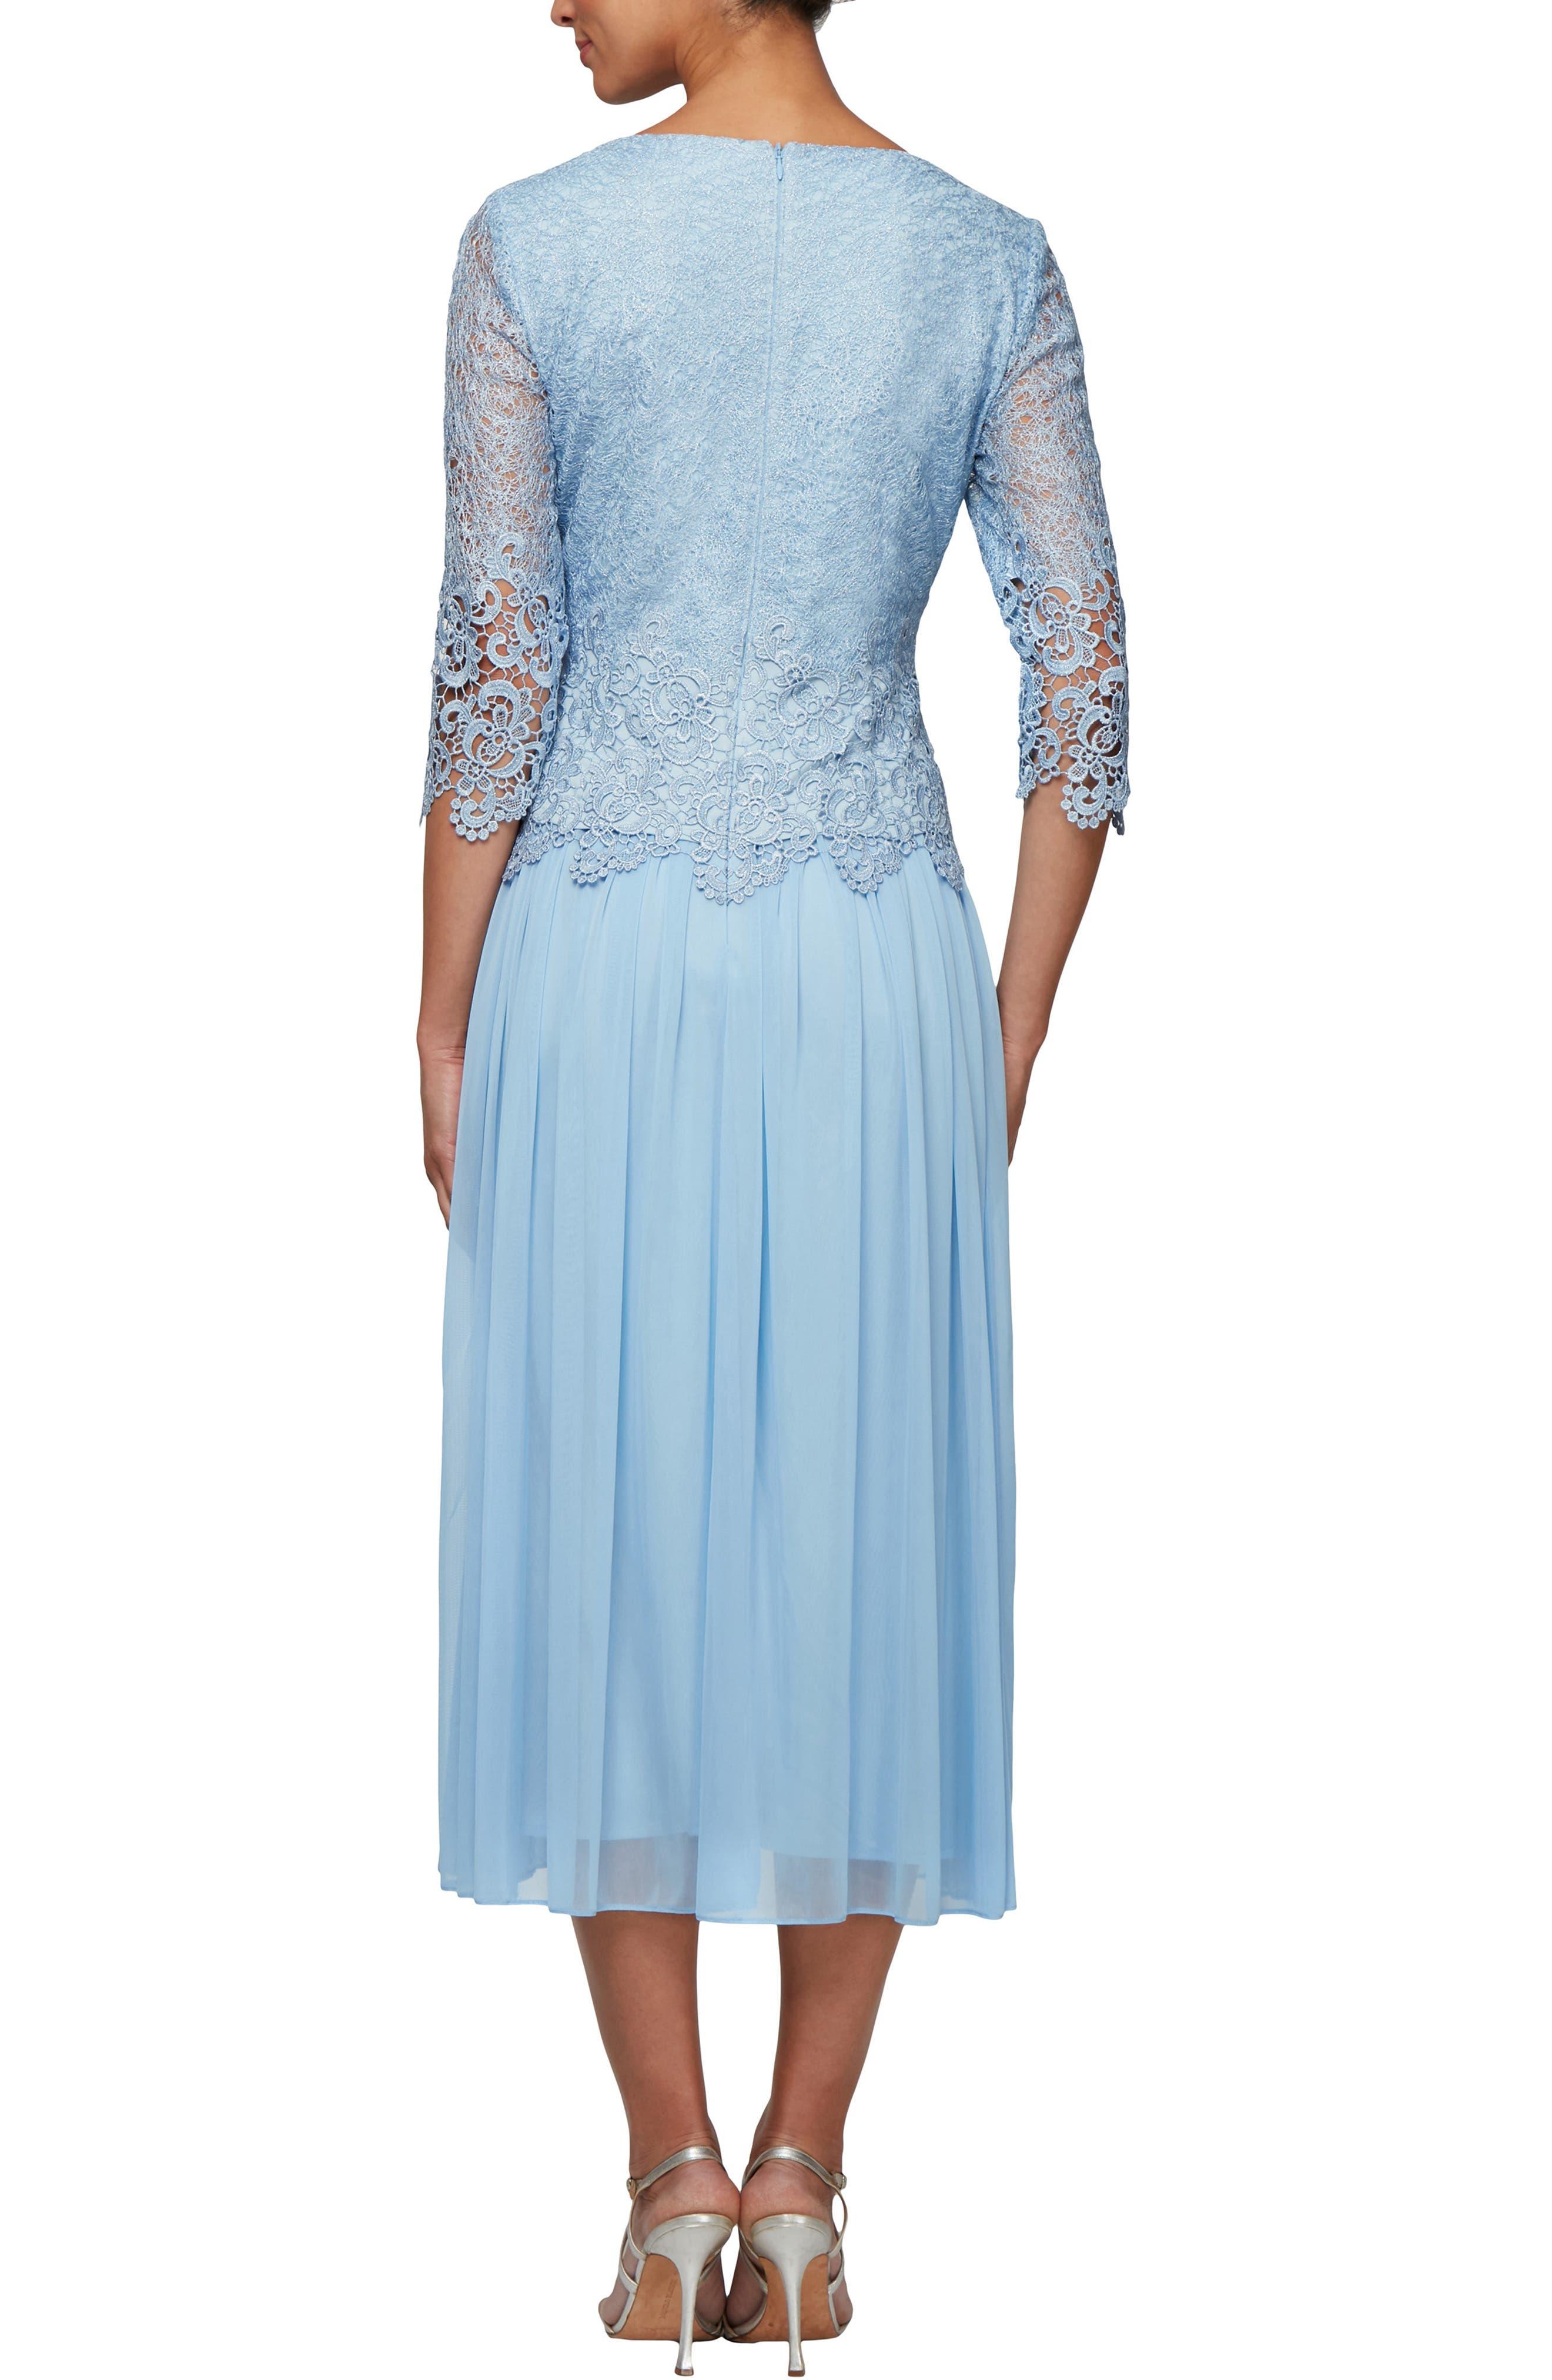 ea5071b09f7 Women s Mother Of The Bride Dresses